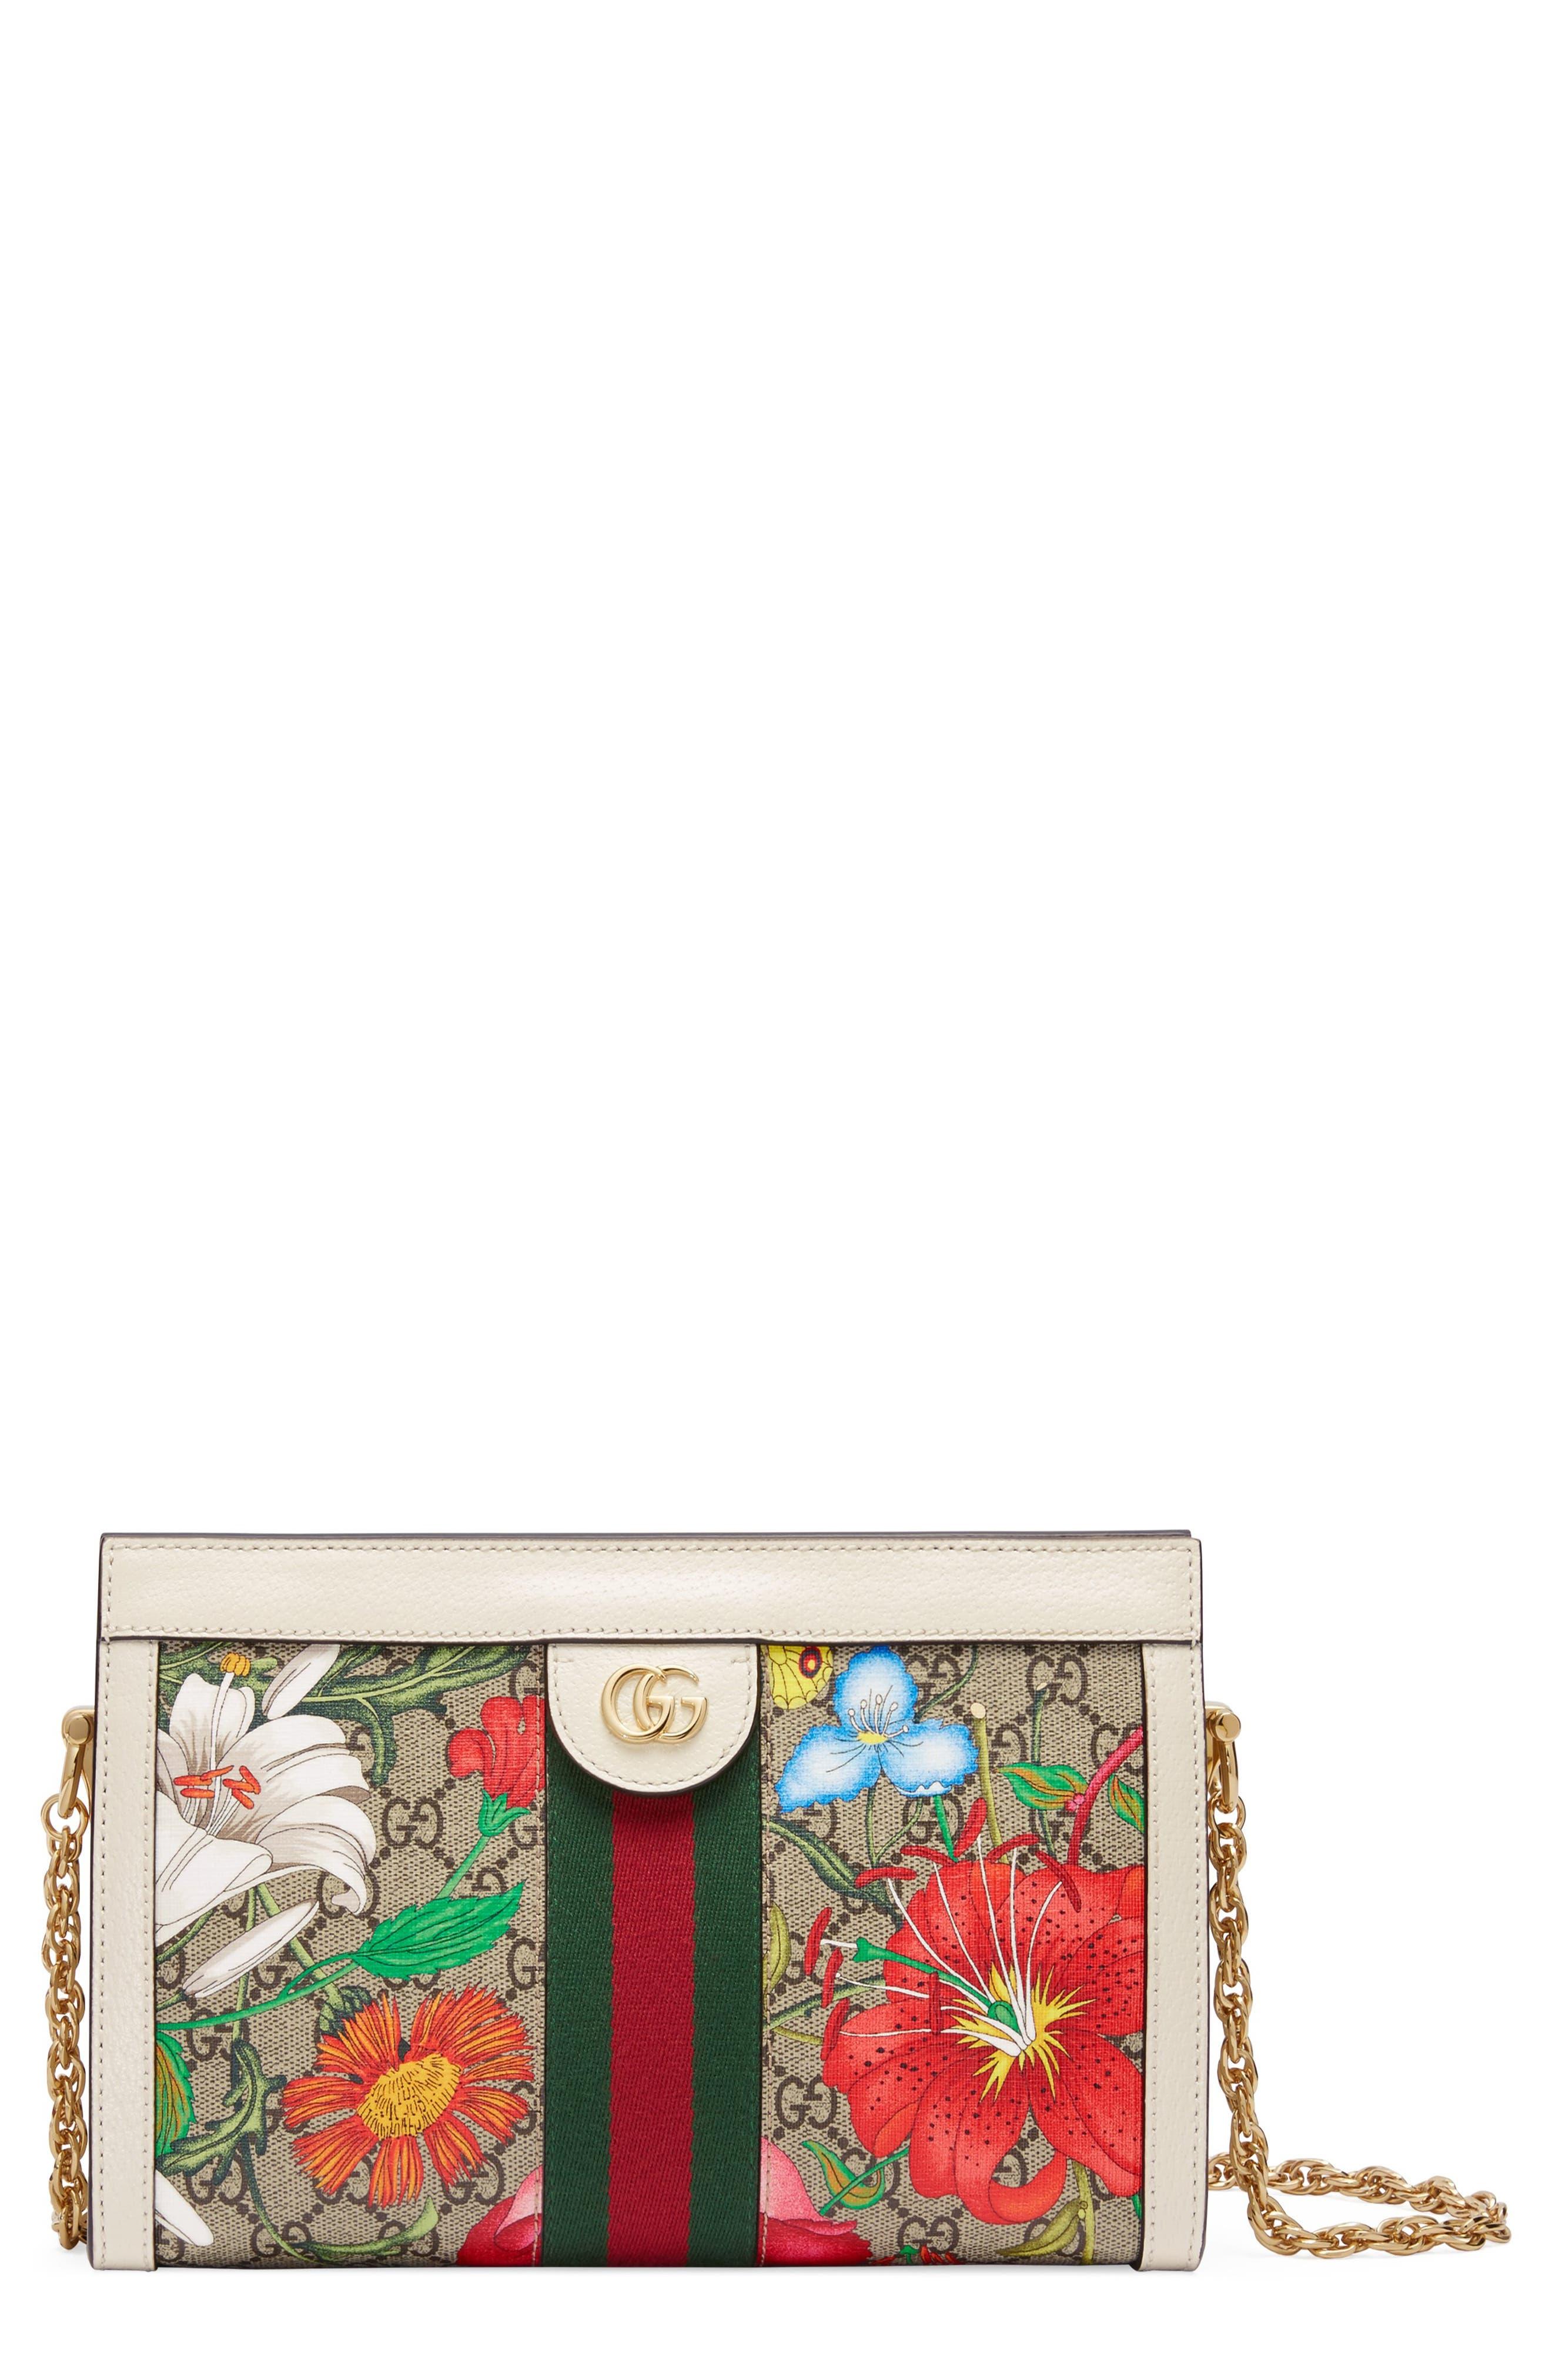 Gucci Small Ophidia Floral GG Supreme Canvas Shoulder Bag | Nordstrom